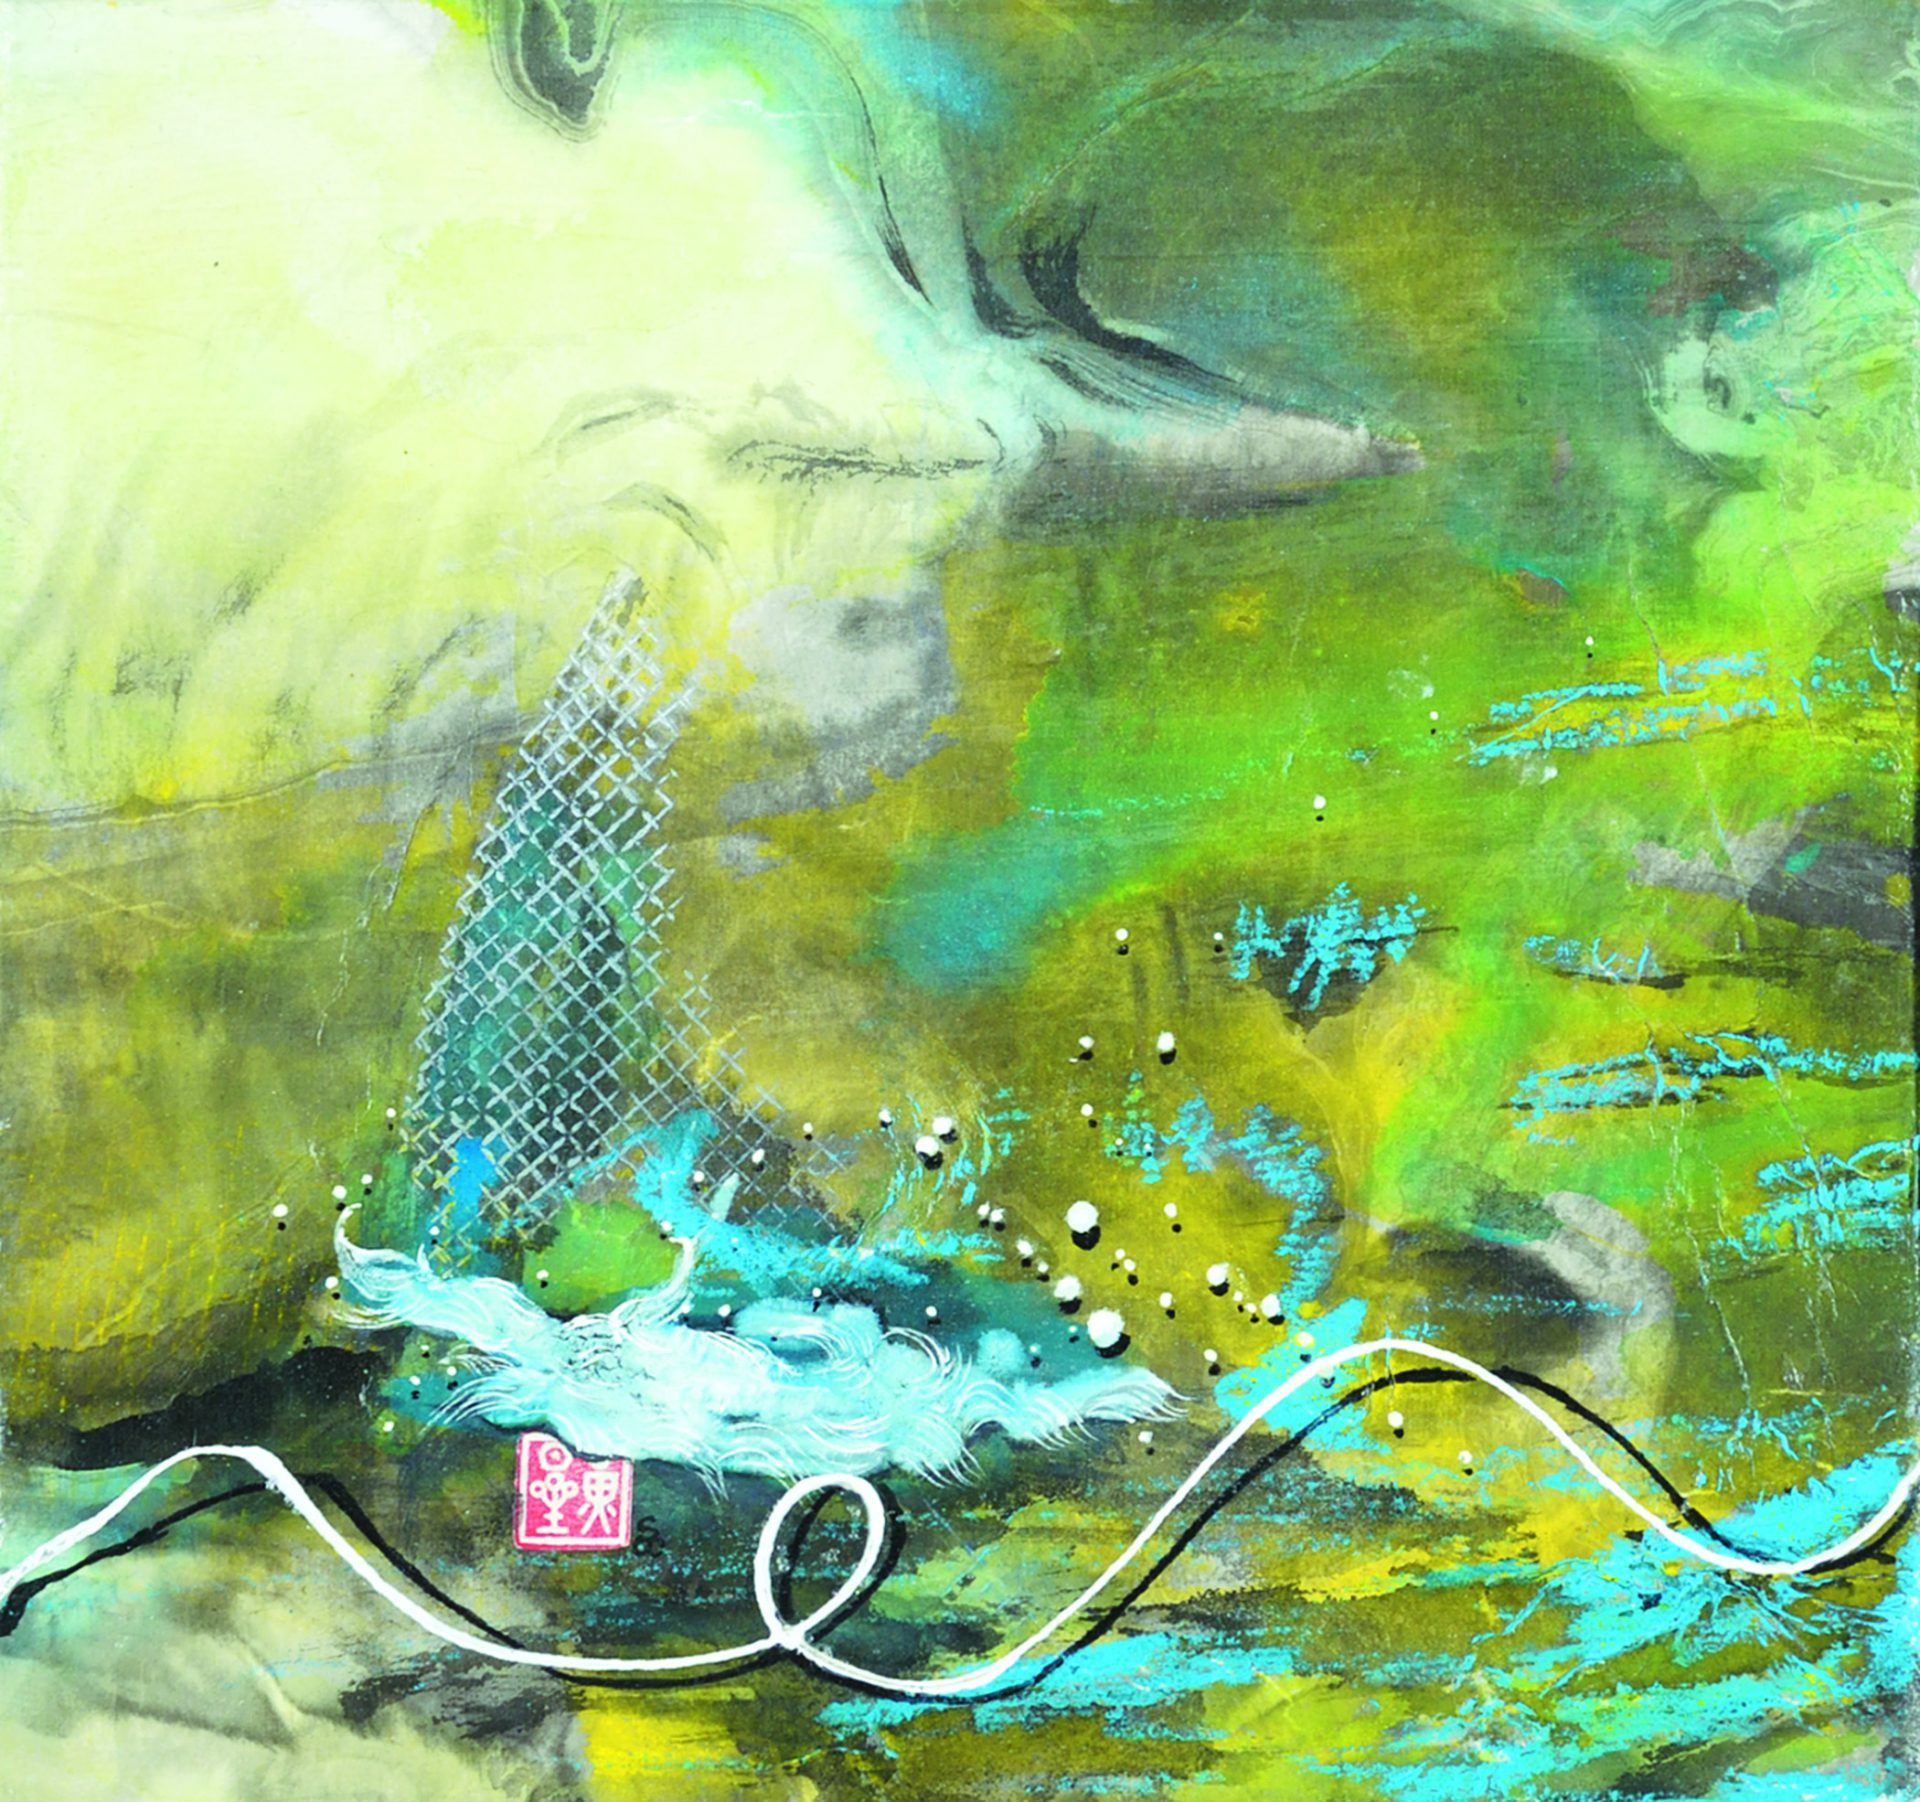 Simon Y S Wong Asa Waves 2014 Kiyooka Ohe Arts Centre